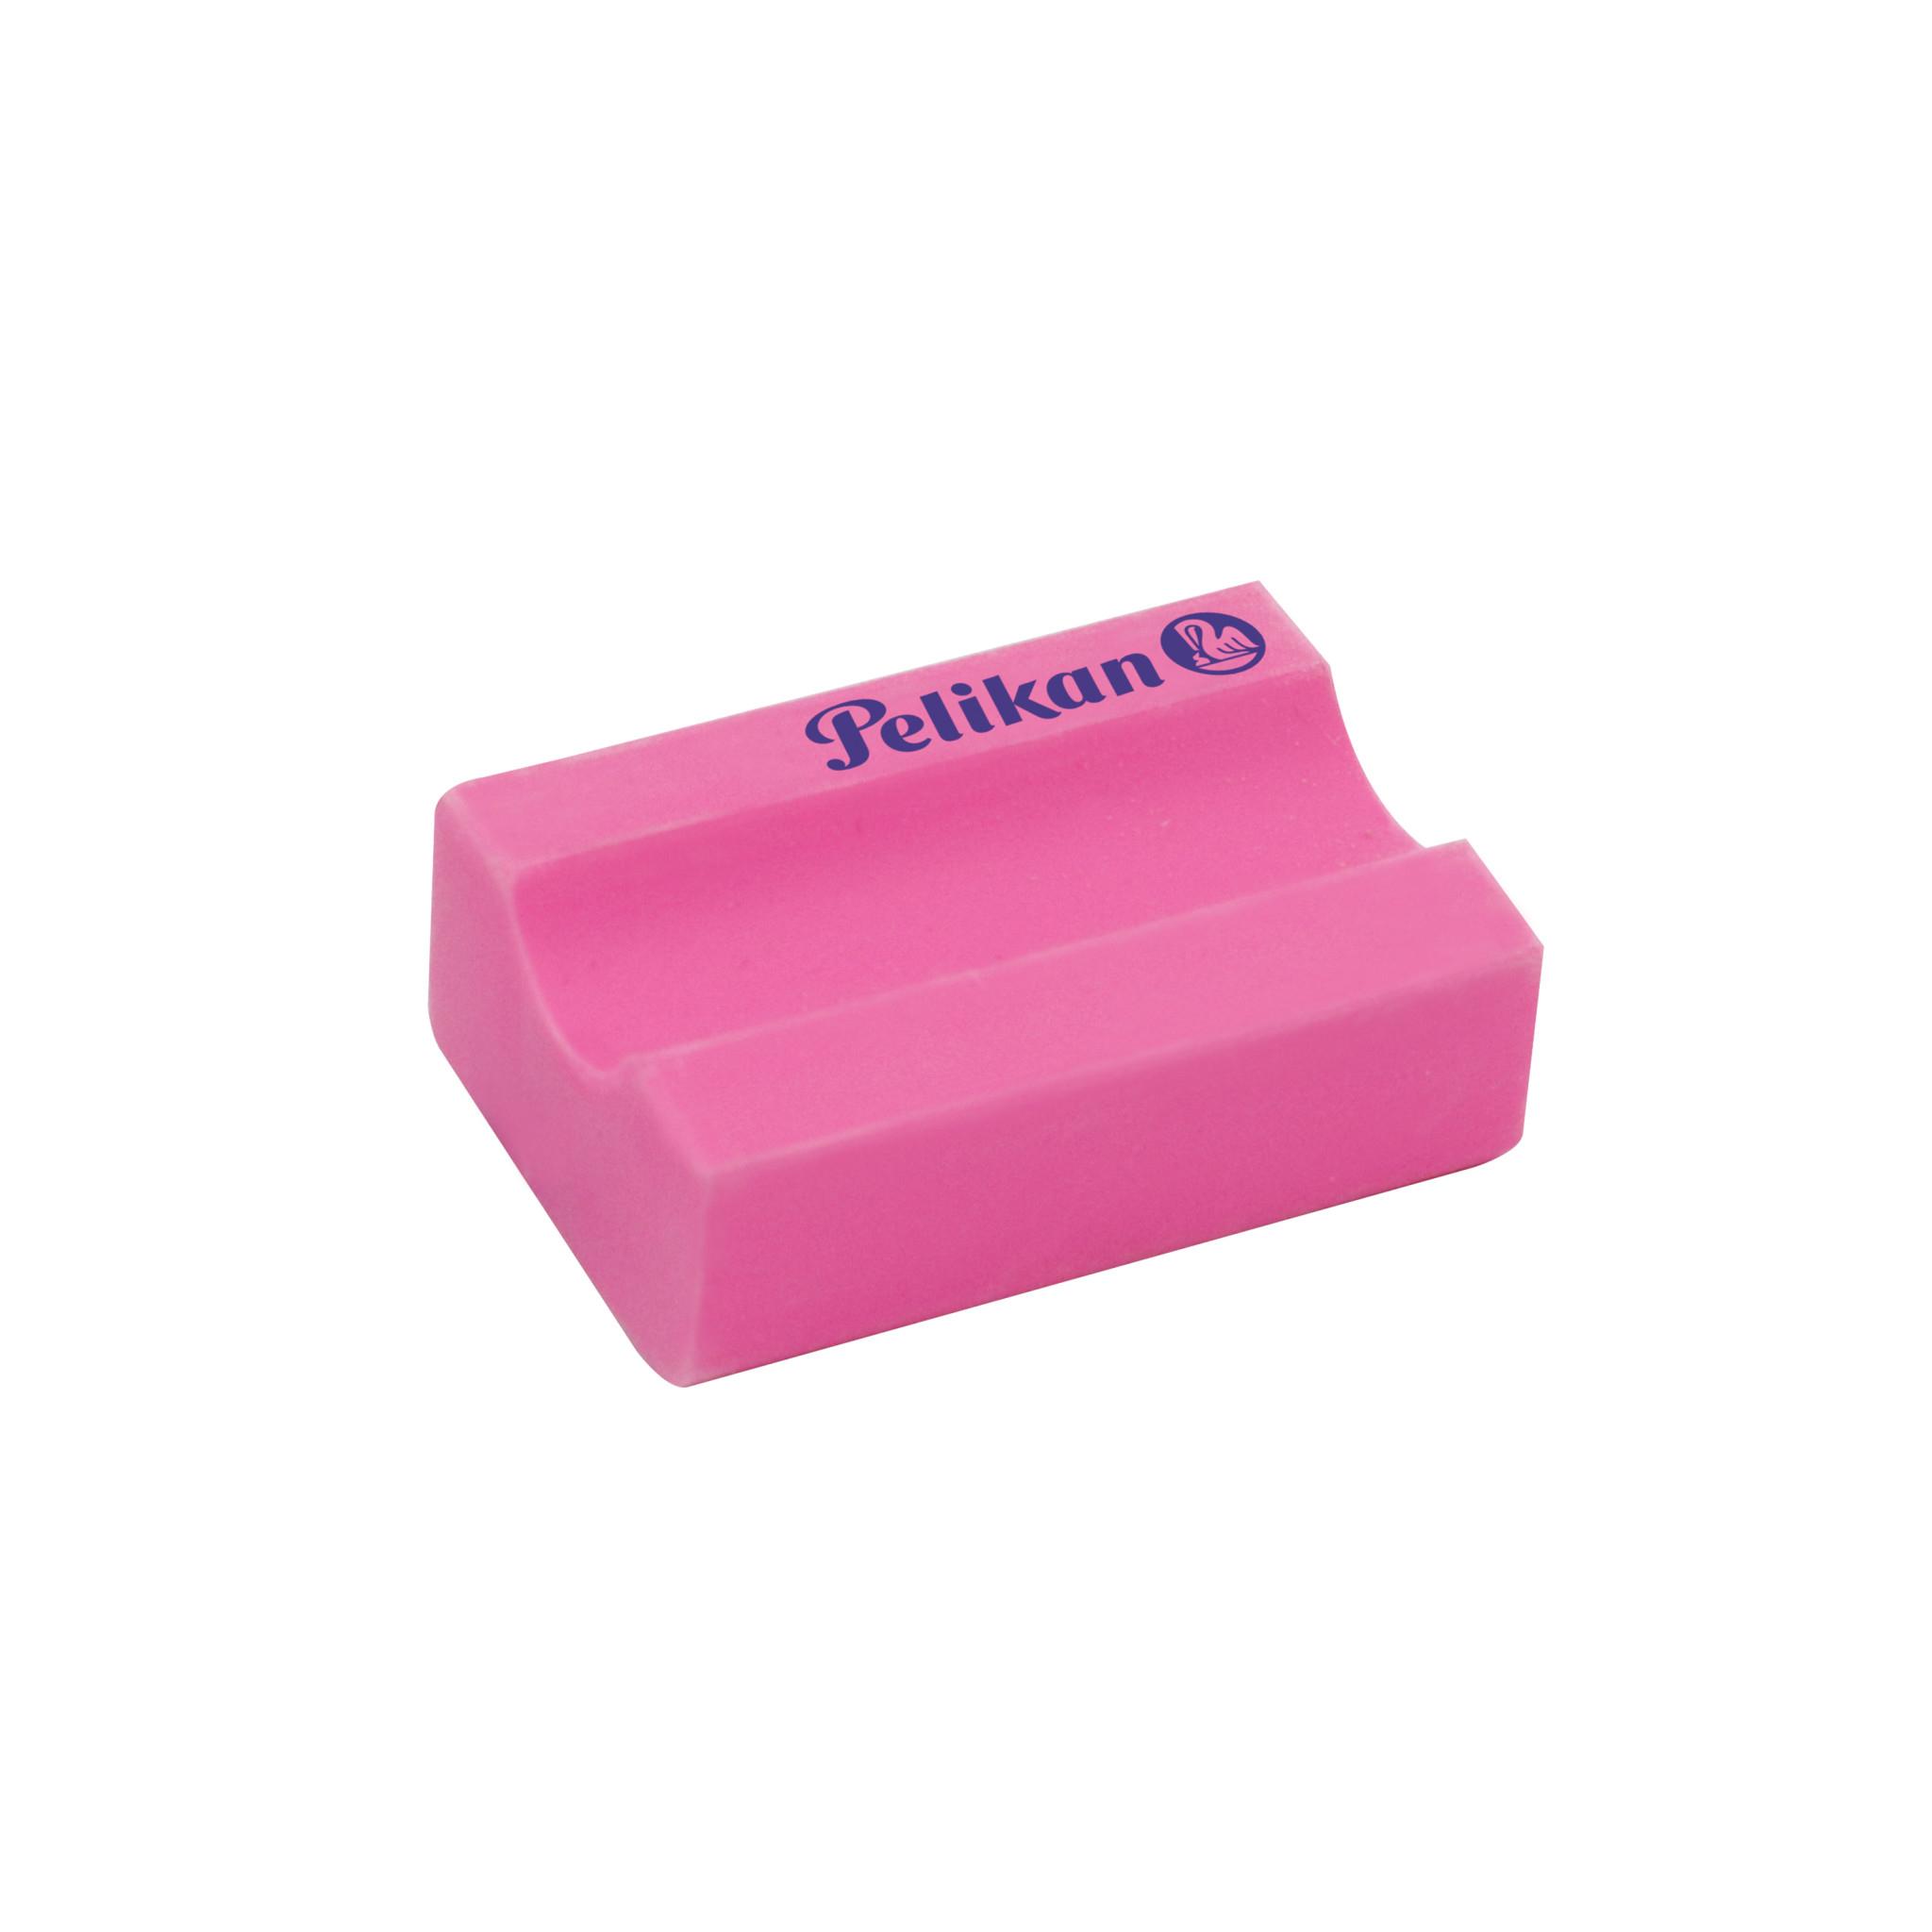 Pelikan 818094 - Gummi - Magenta - Gelb - Sichtverpackung - 2 Stück(e)